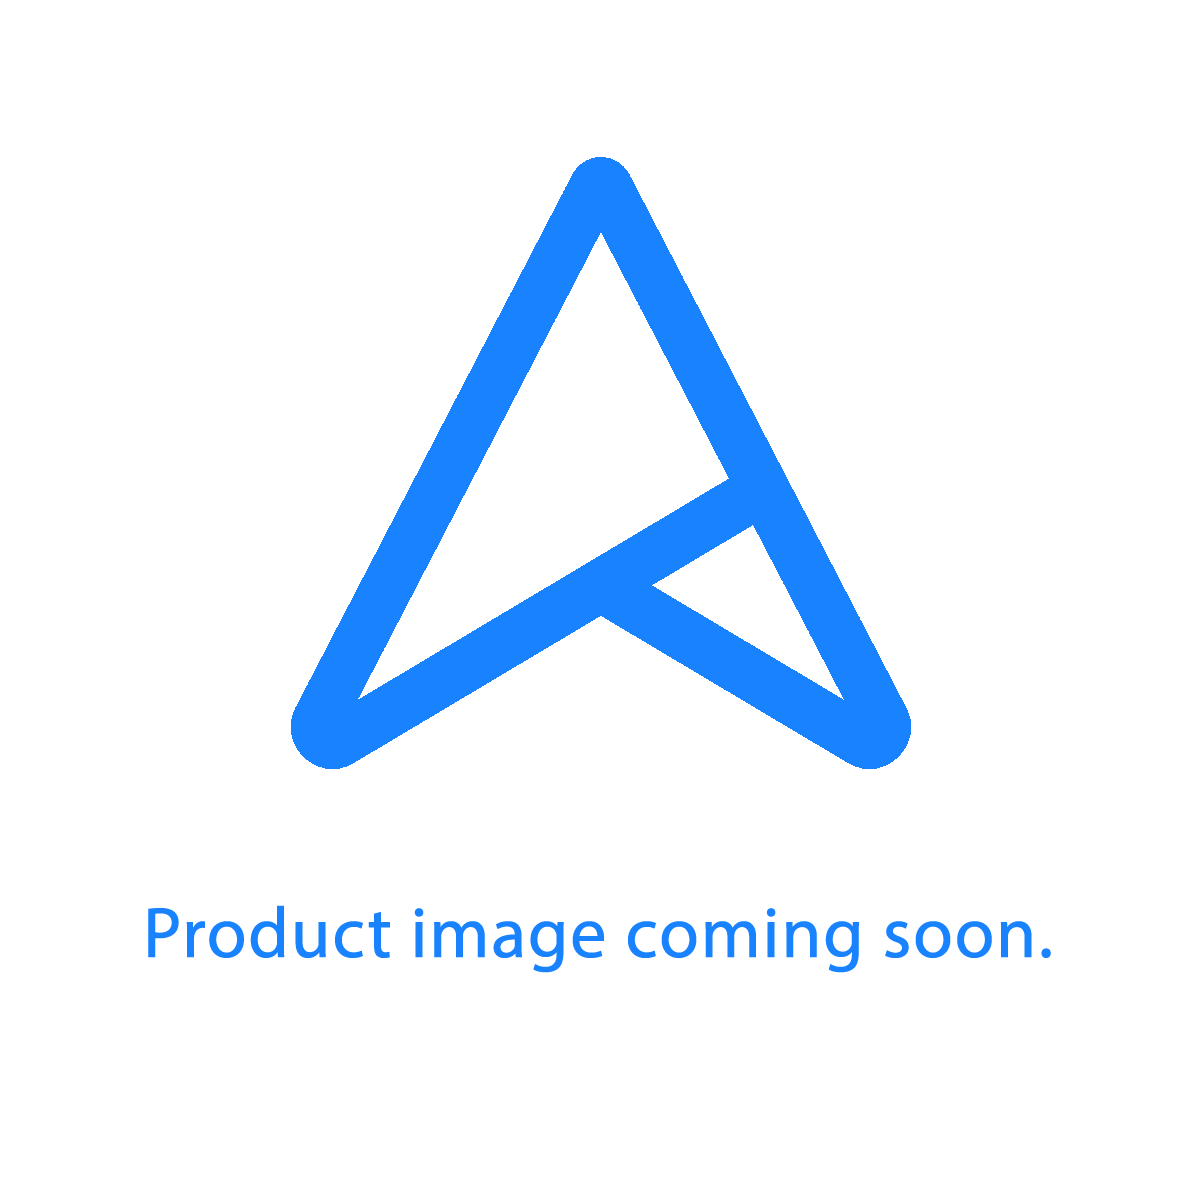 ASUS Vivobook Gaming 15 F571LH-AL282T